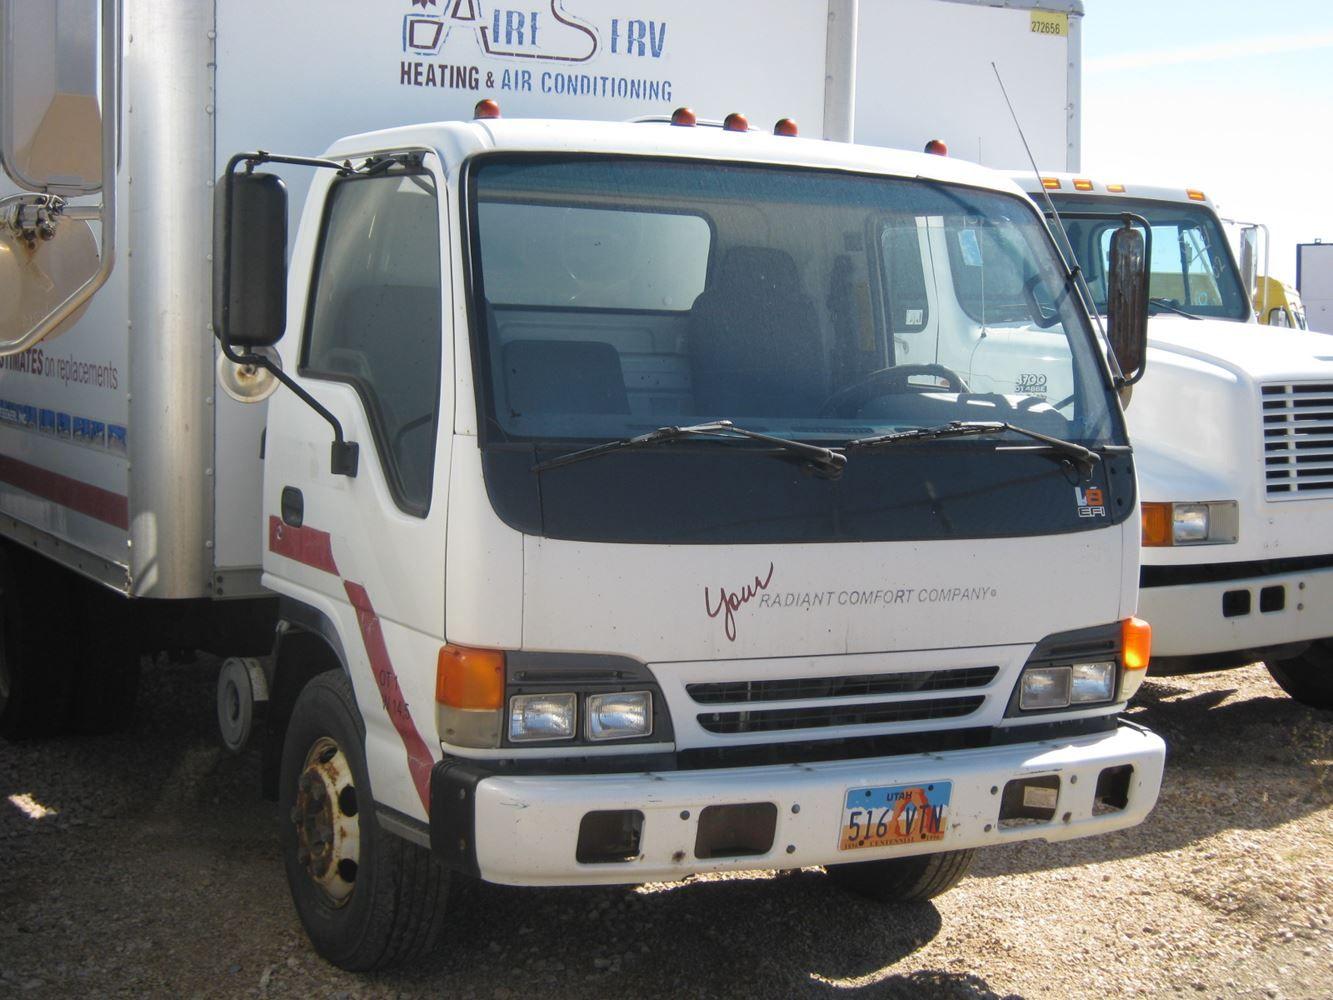 Isuzu Npr Parts Used Near Me 300 Manual Ireland Catalog Pdf Truck By Vin Interstate Auto Max Pumping Car Dodge Truck Parts Packing Car